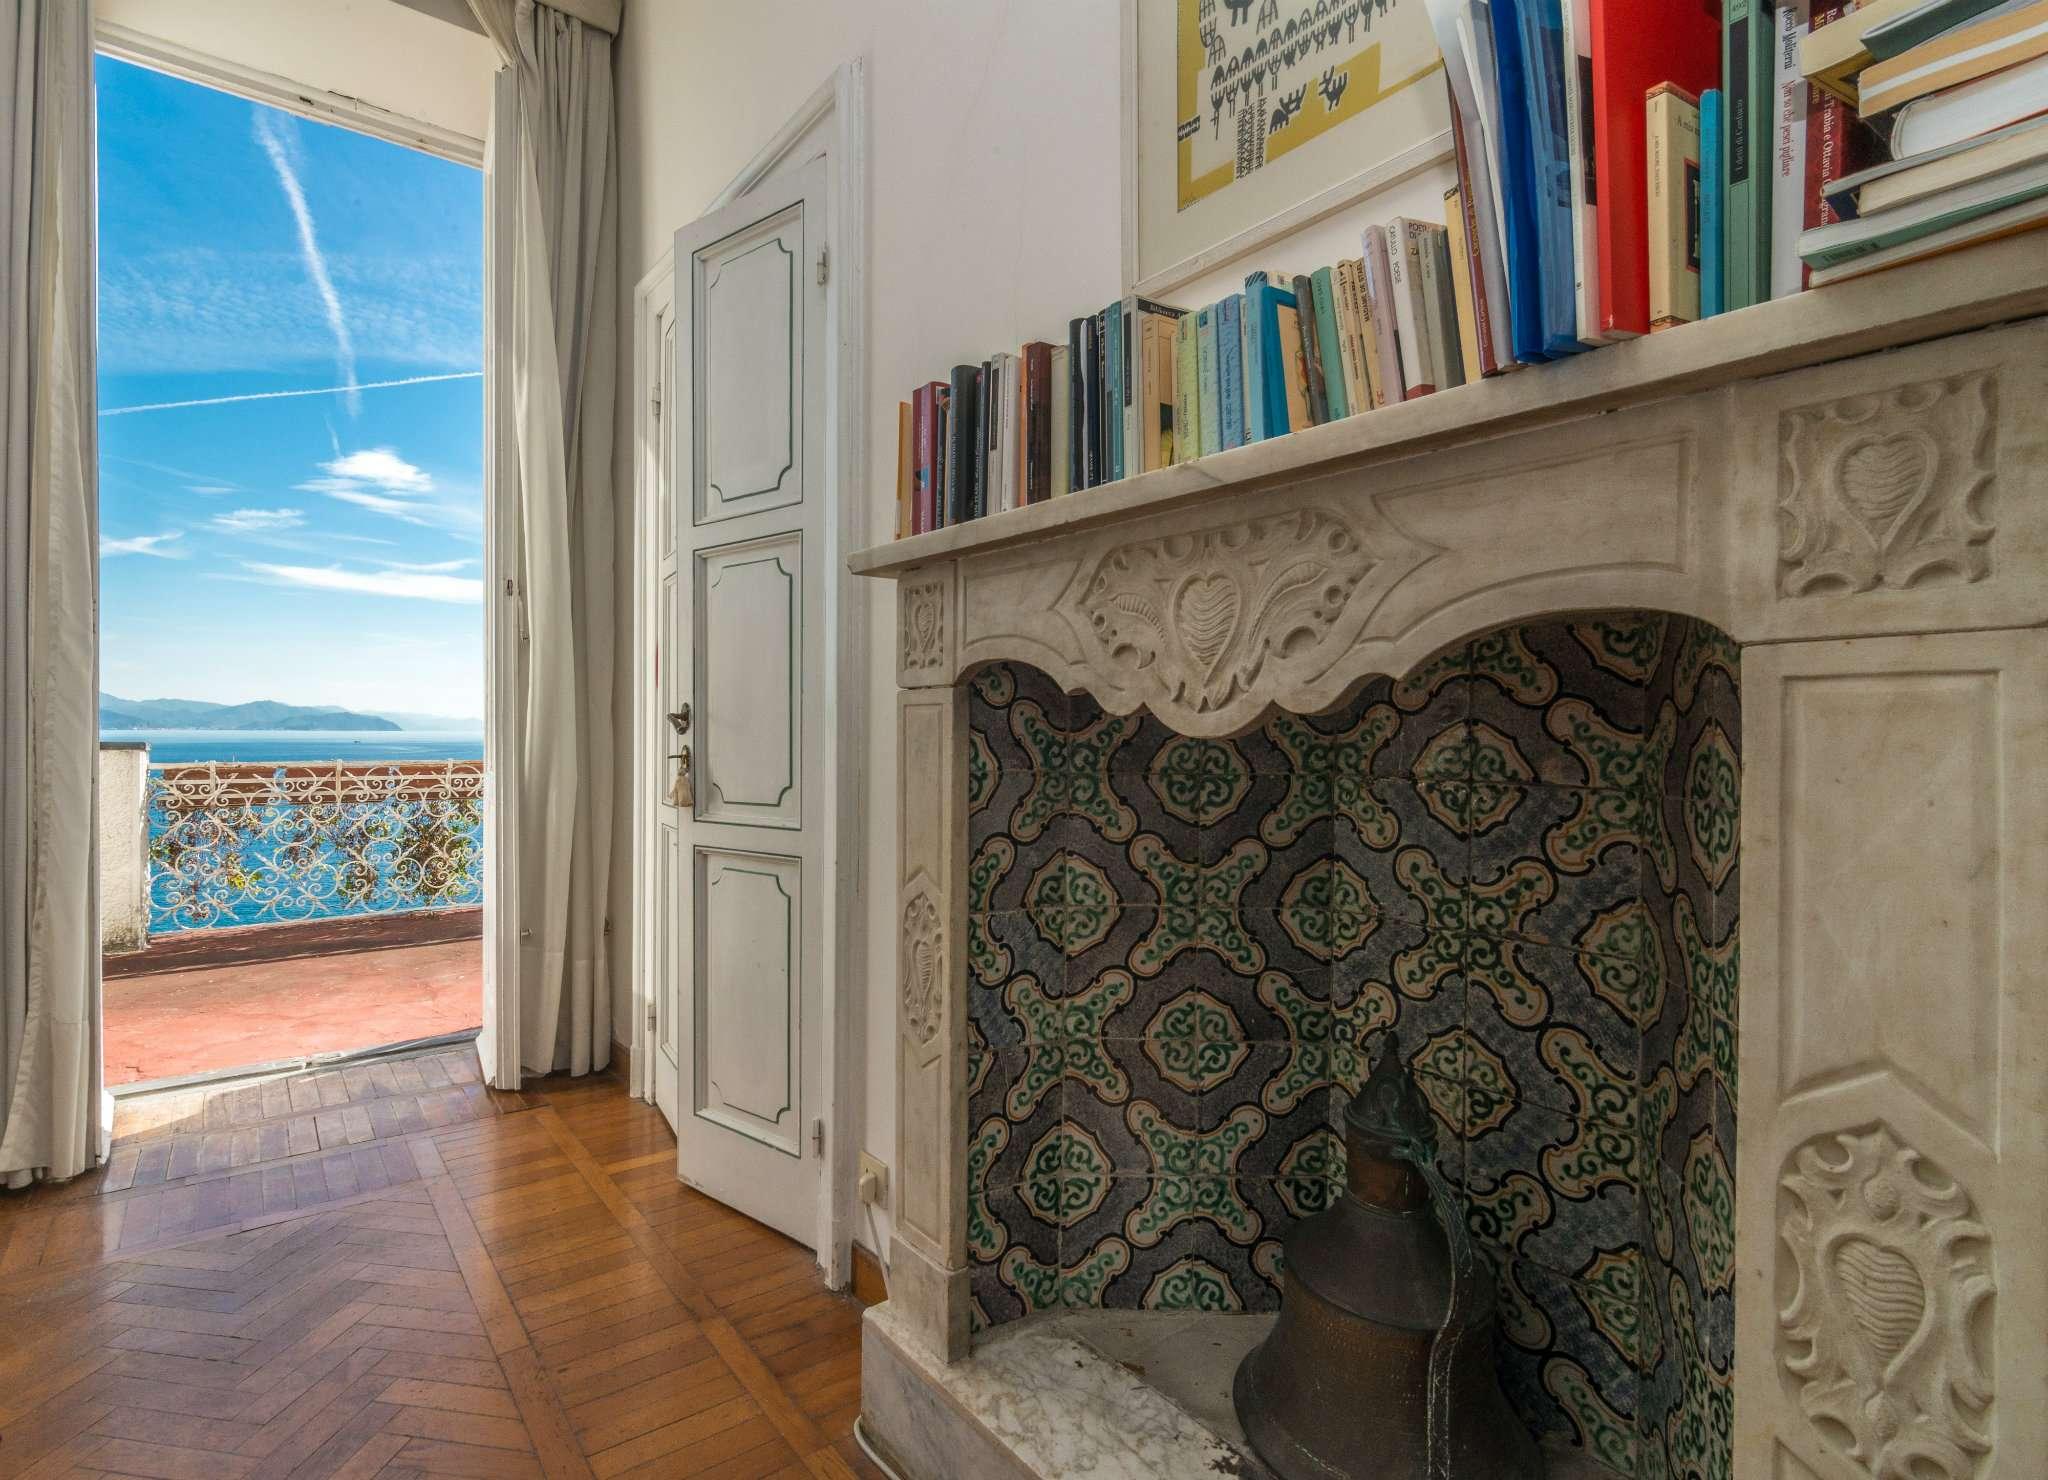 Villa in Vendita a Santa Margherita Ligure: 5 locali, 545 mq - Foto 15